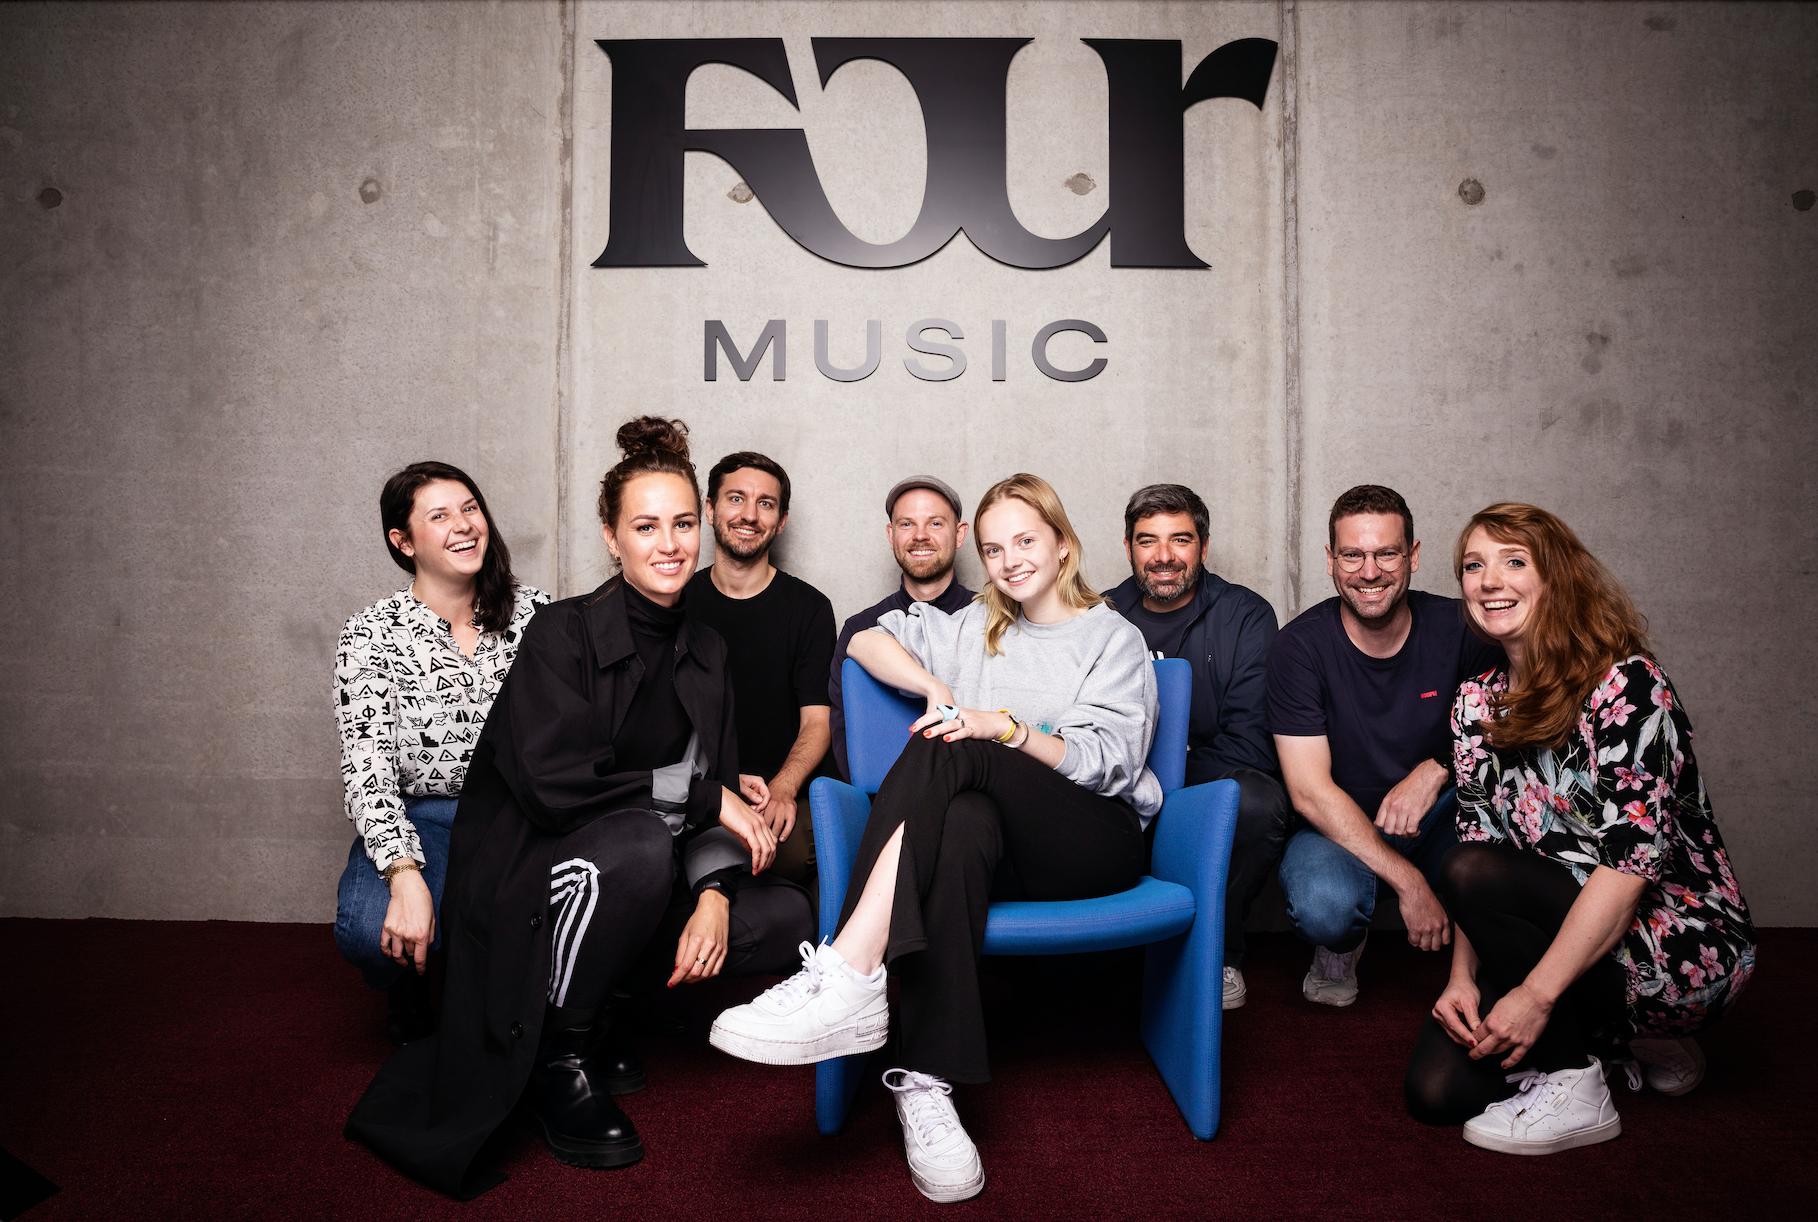 Paula Hartmann unterschreibt bei Four Music